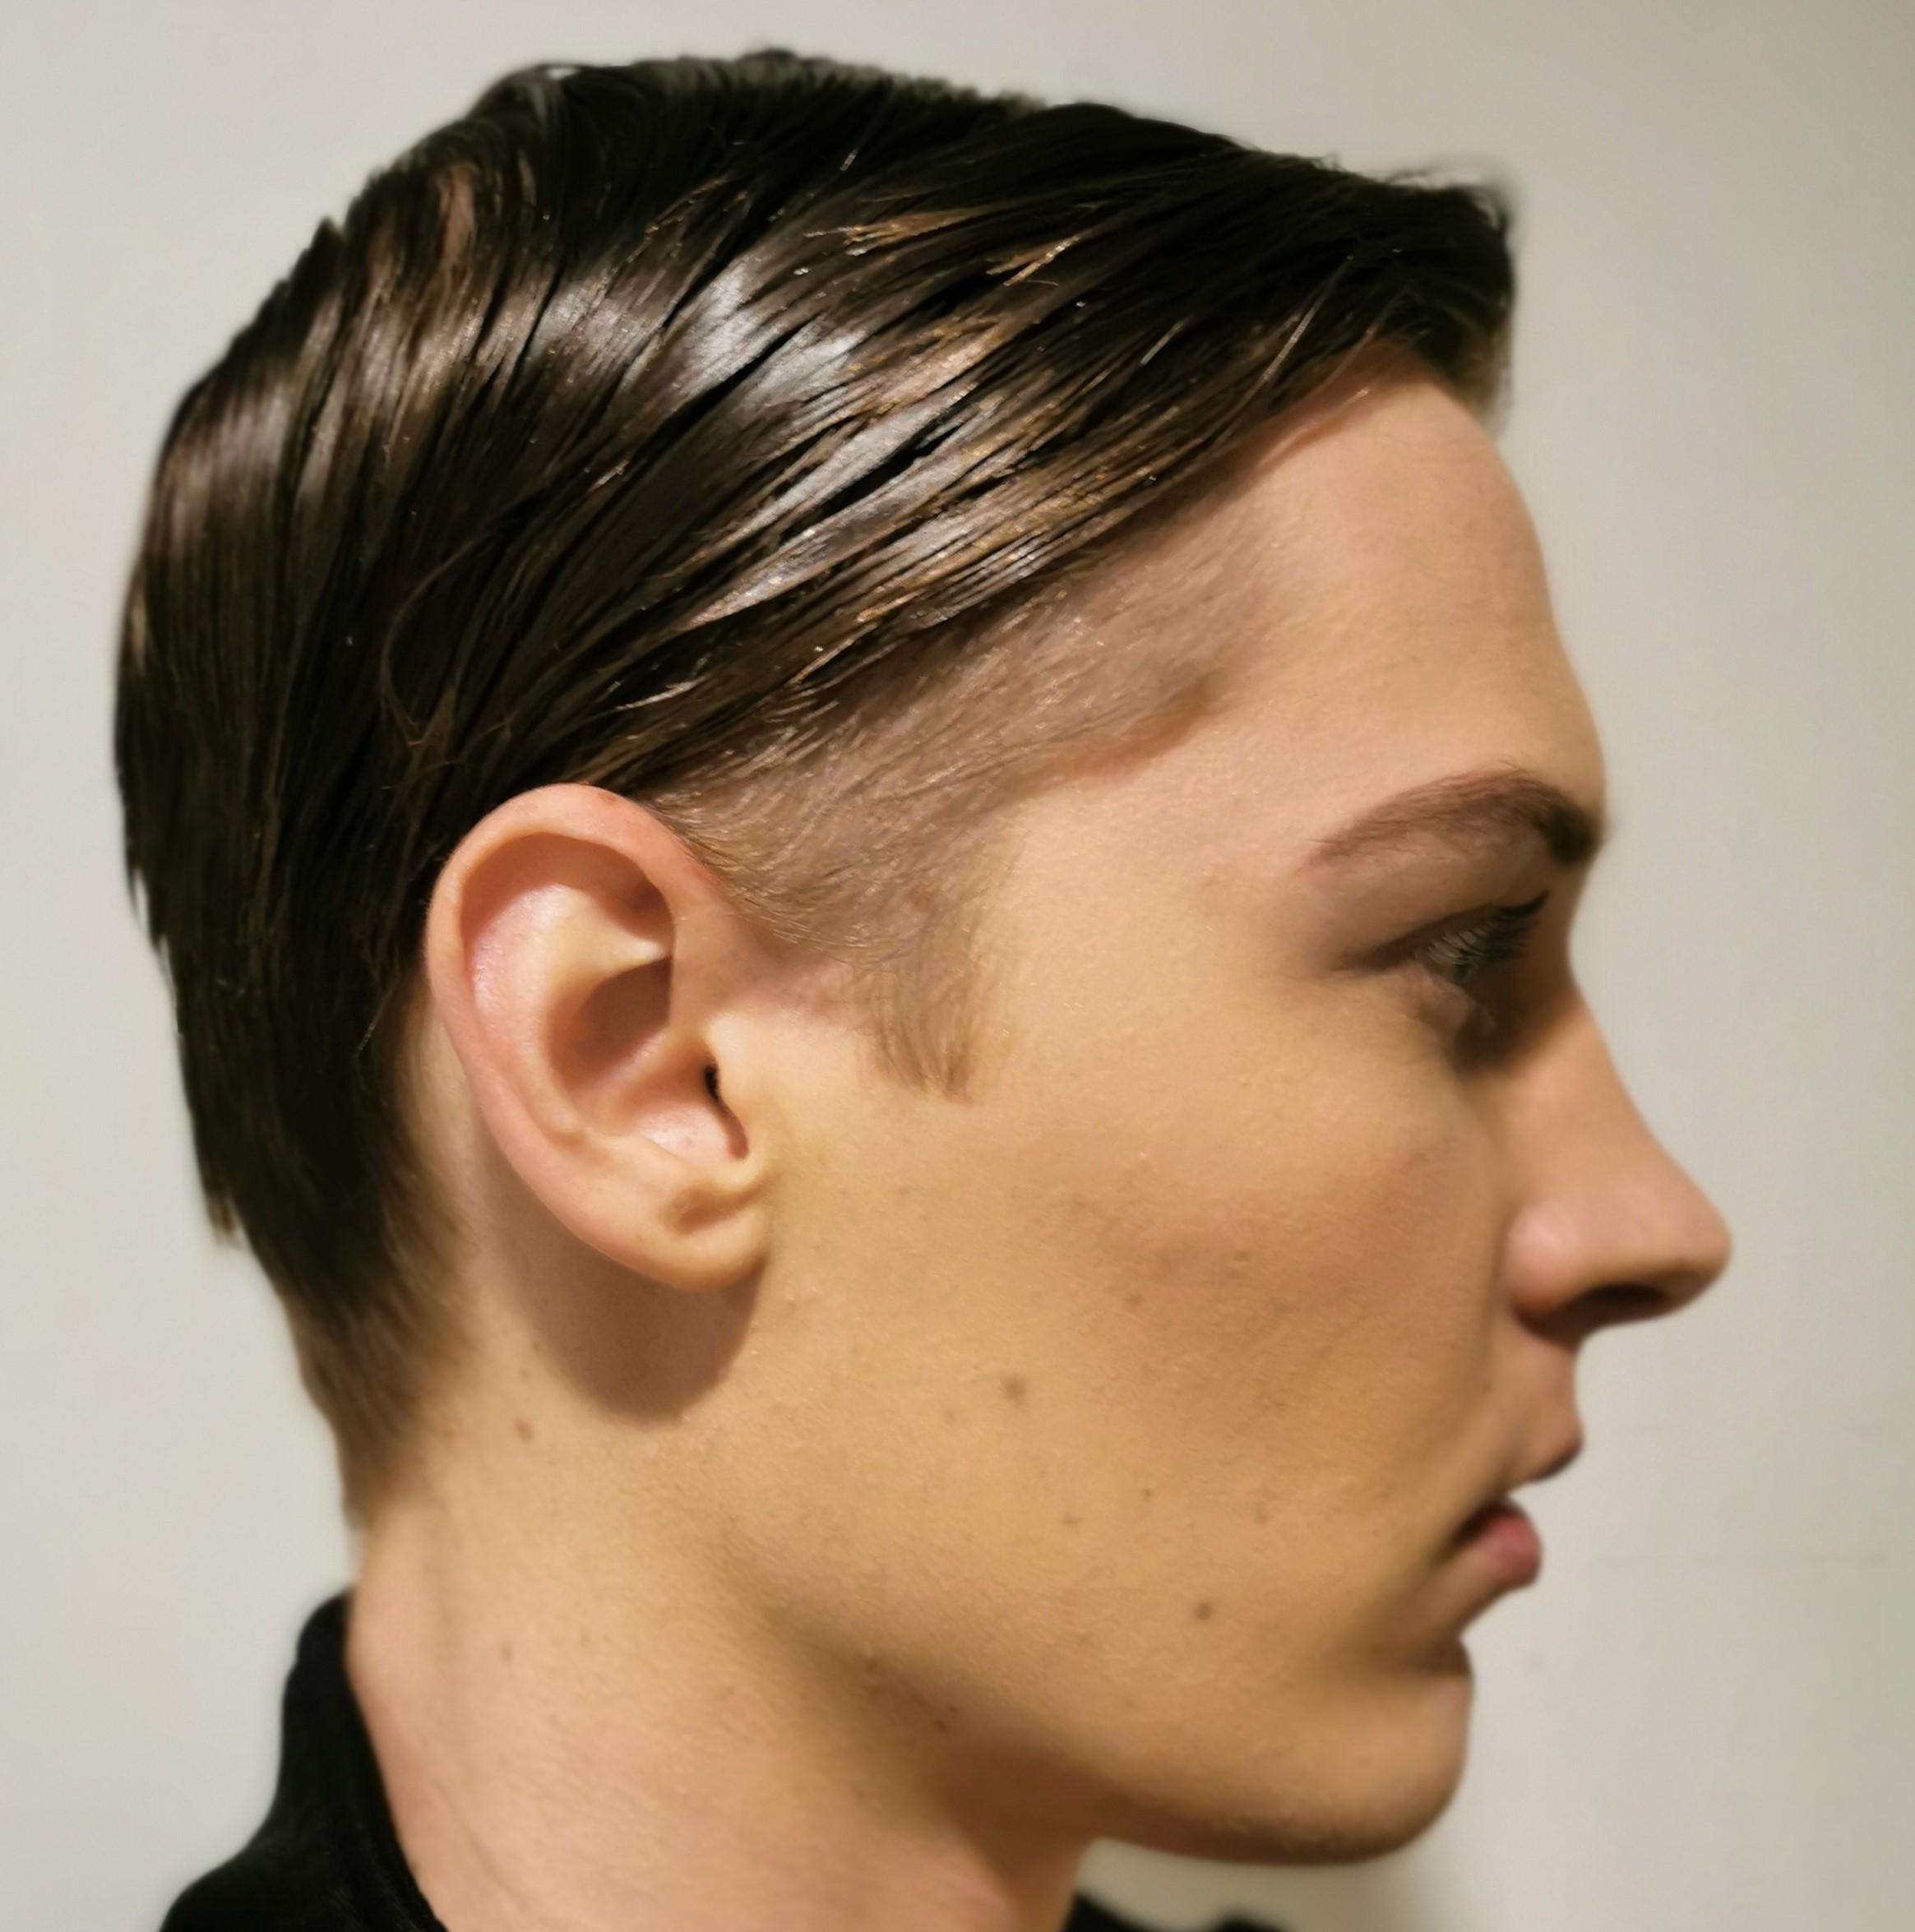 Men's Hair Style 5